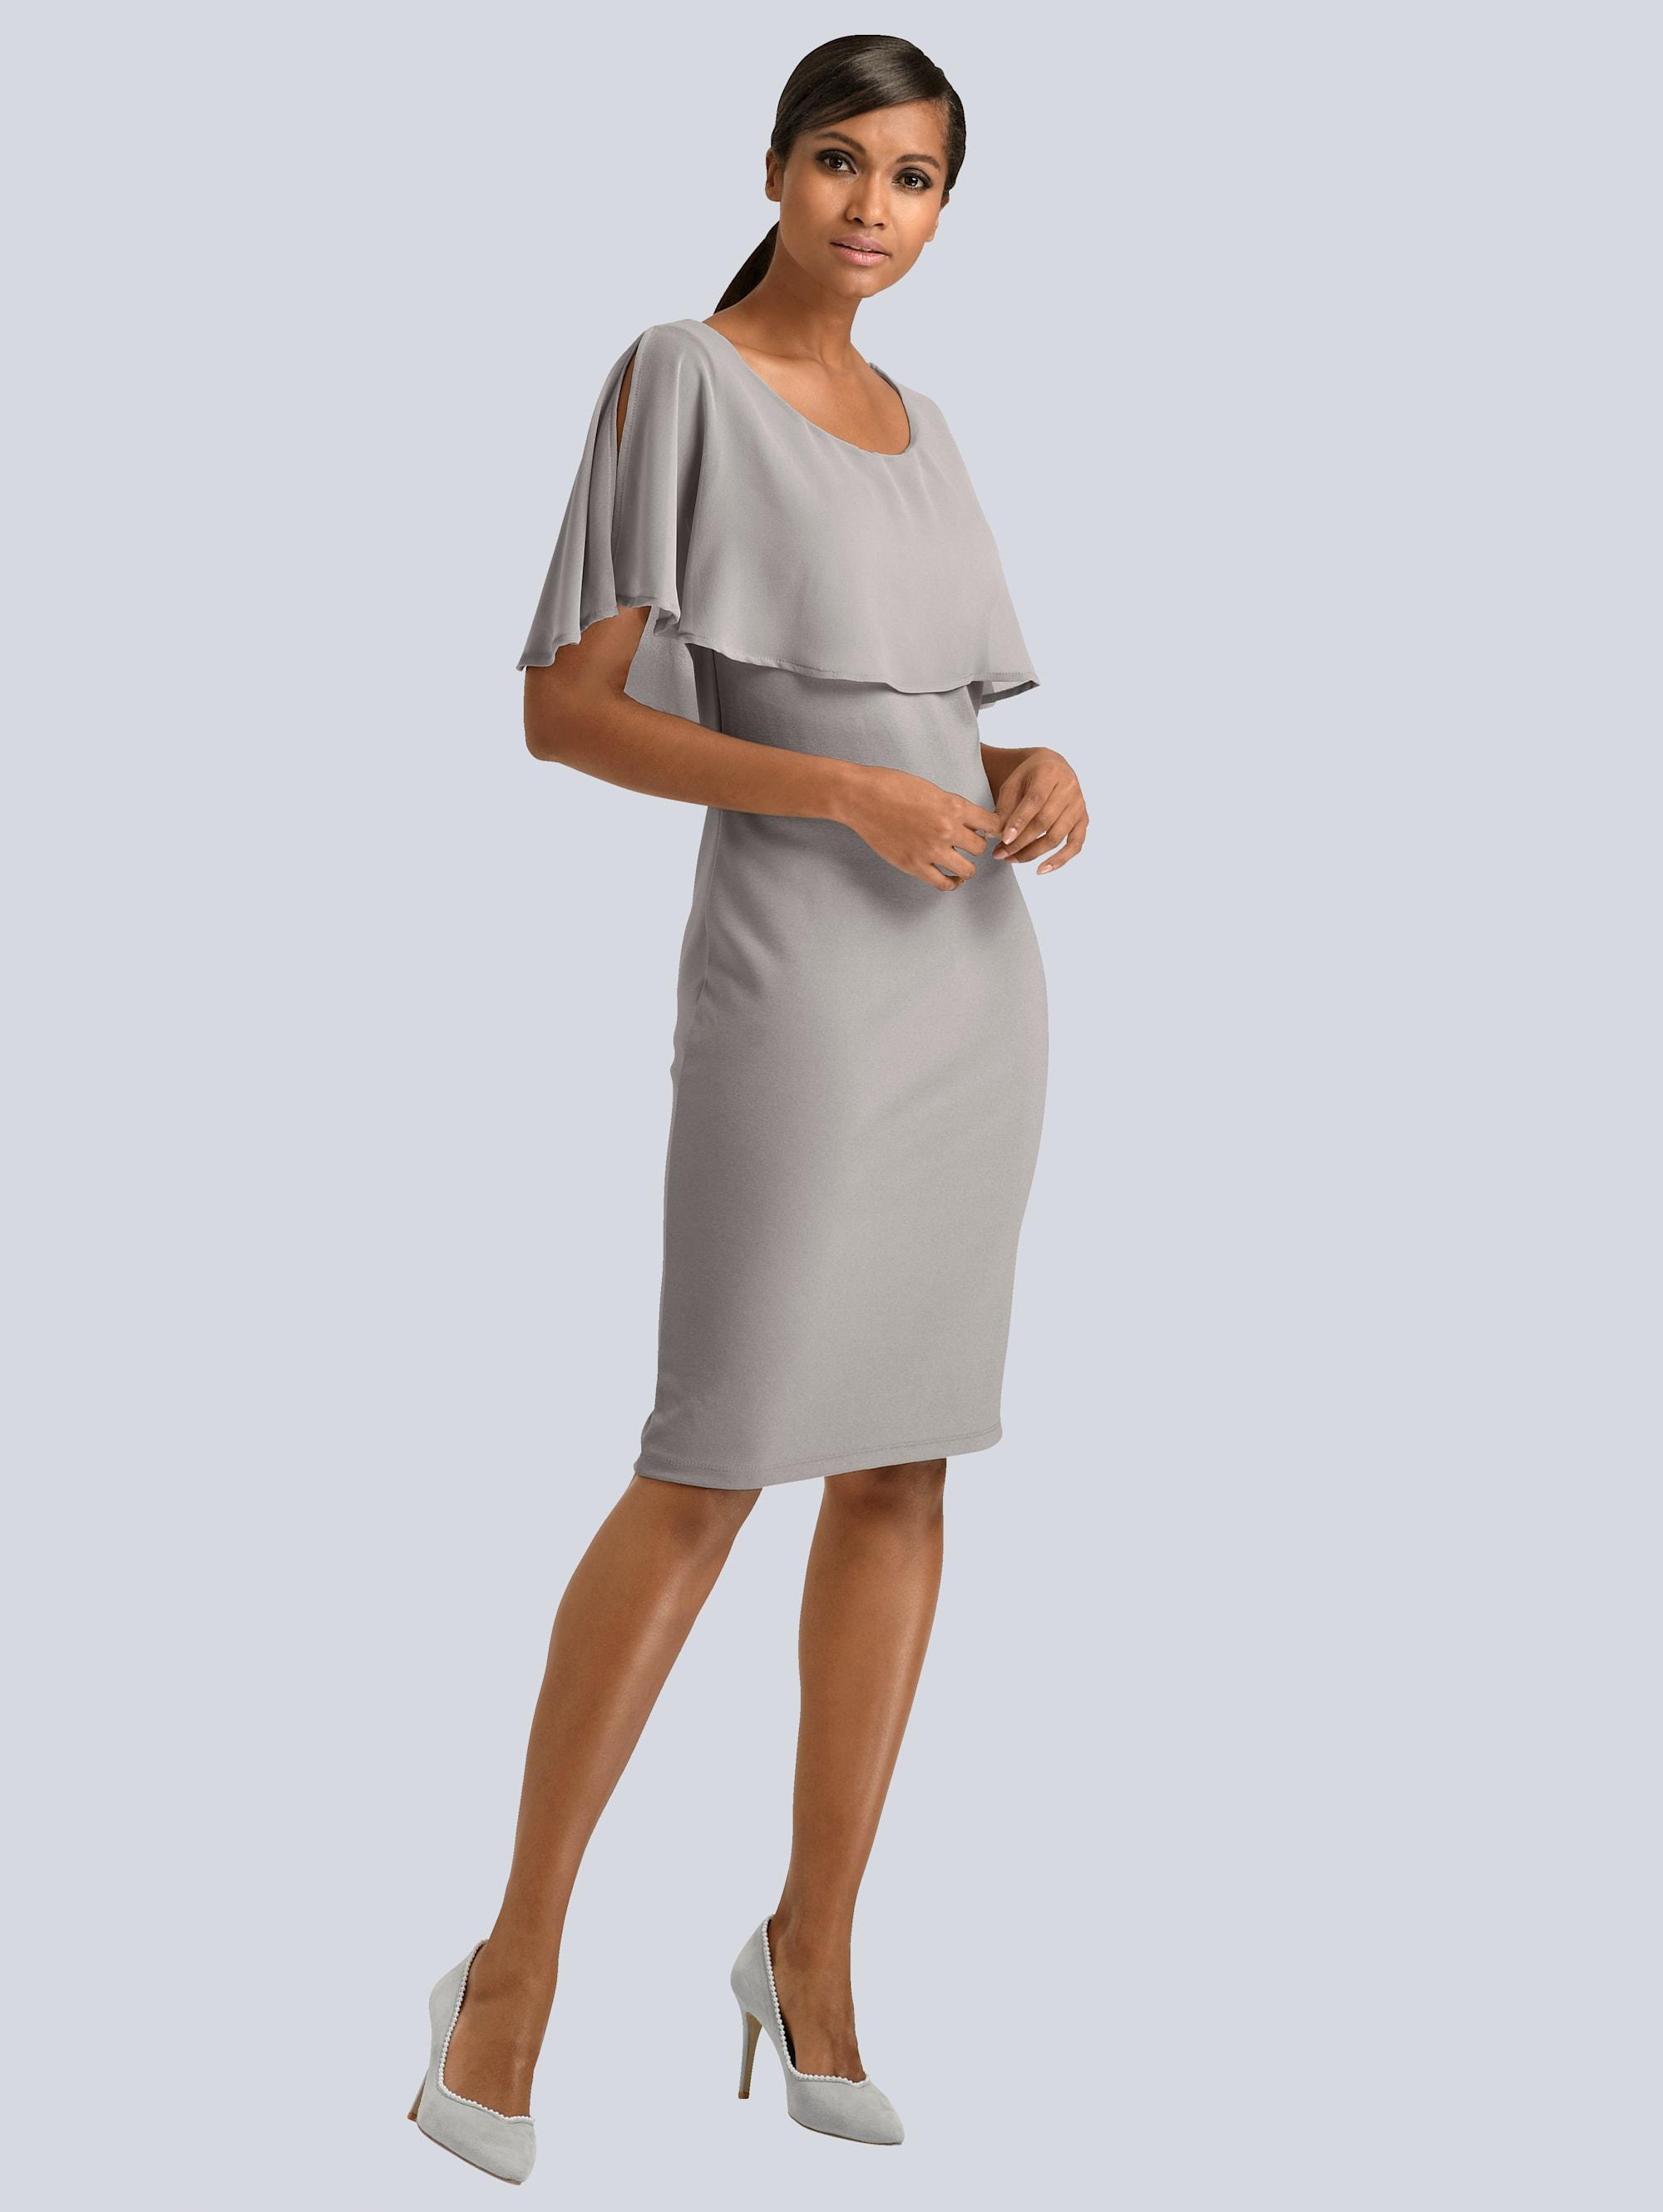 Alba Moda Kleid mit Chiffon-Layer uMPC3 iHpxN